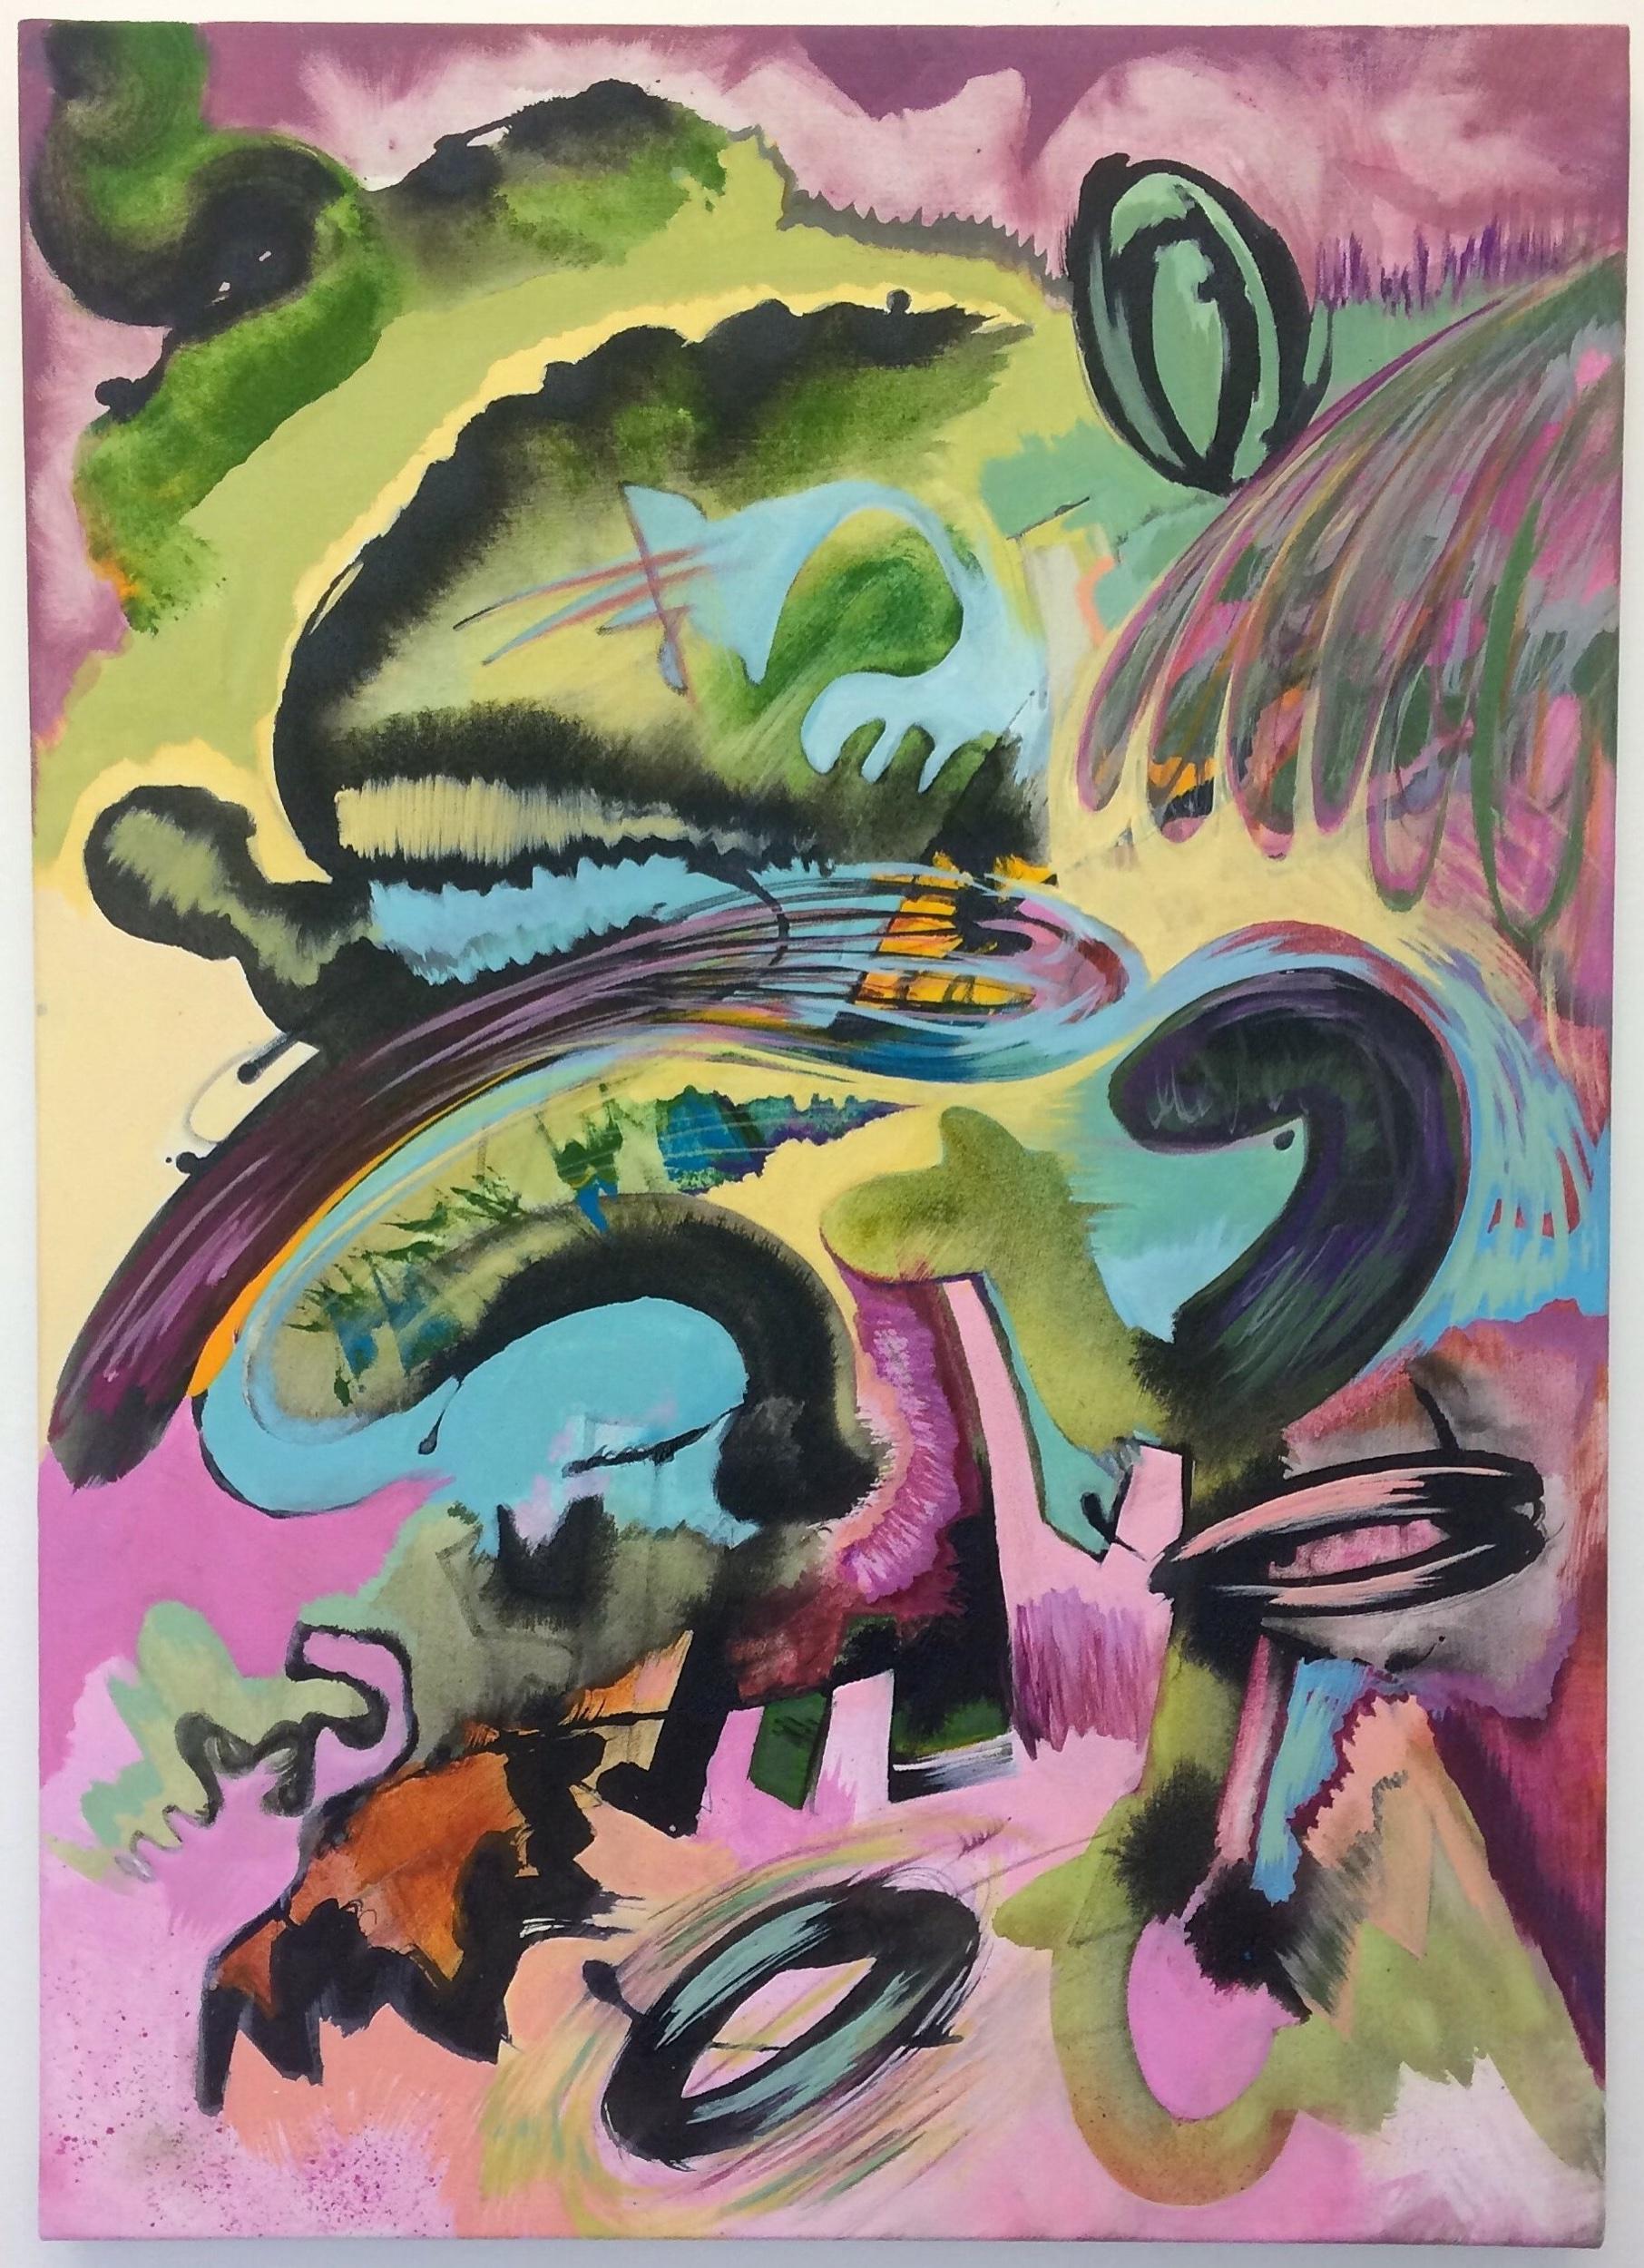 2. Chronic looper, 2018, acrylic on canvas, 70cm x 50cm.jpeg